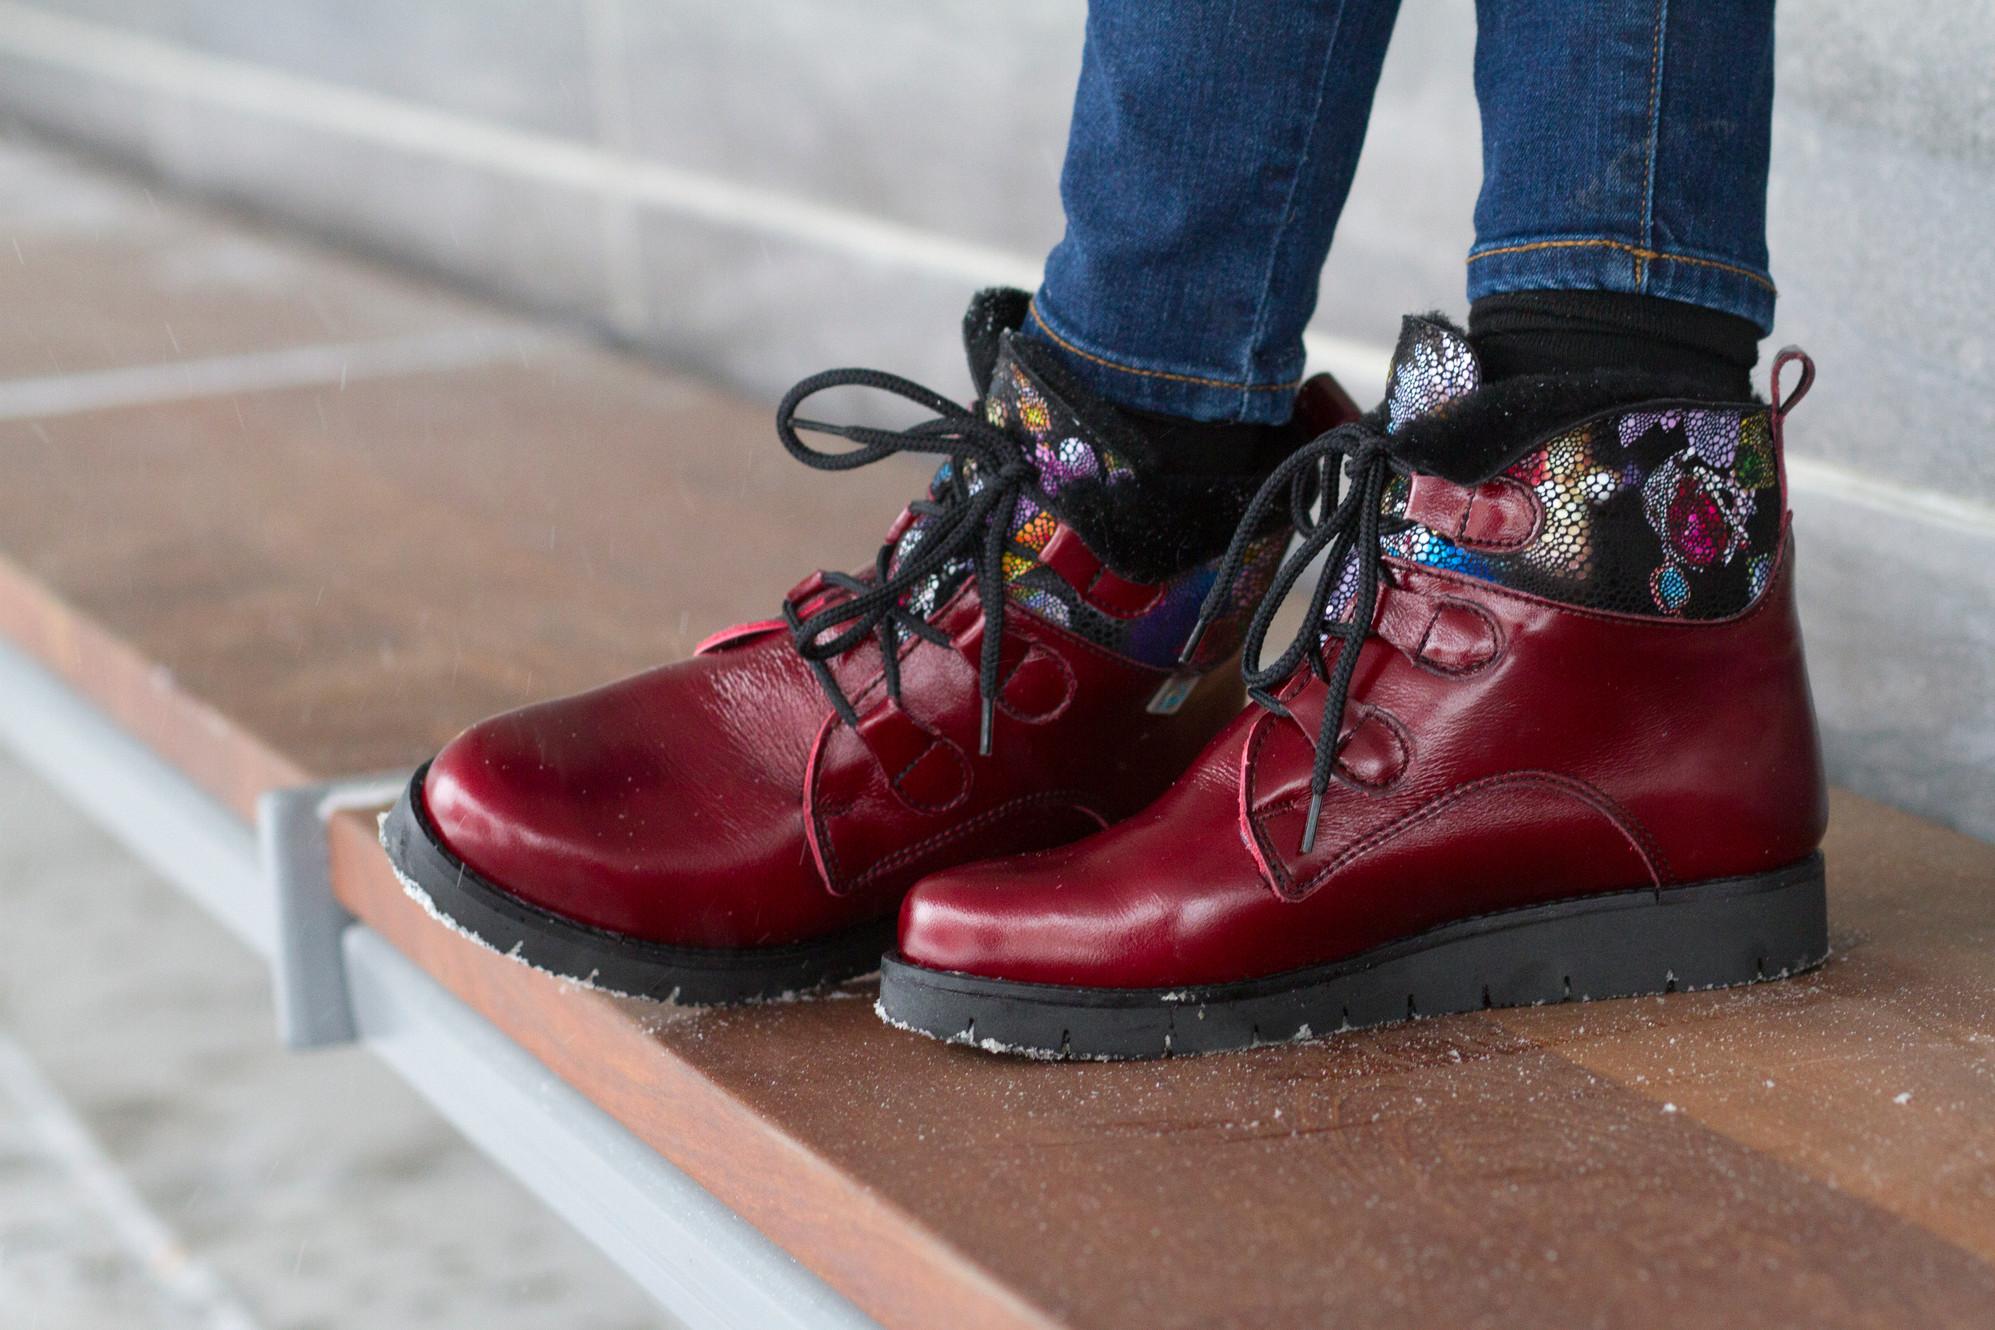 Fb Bottines Co BootsBottes Fashion Et wTOZPkXuli